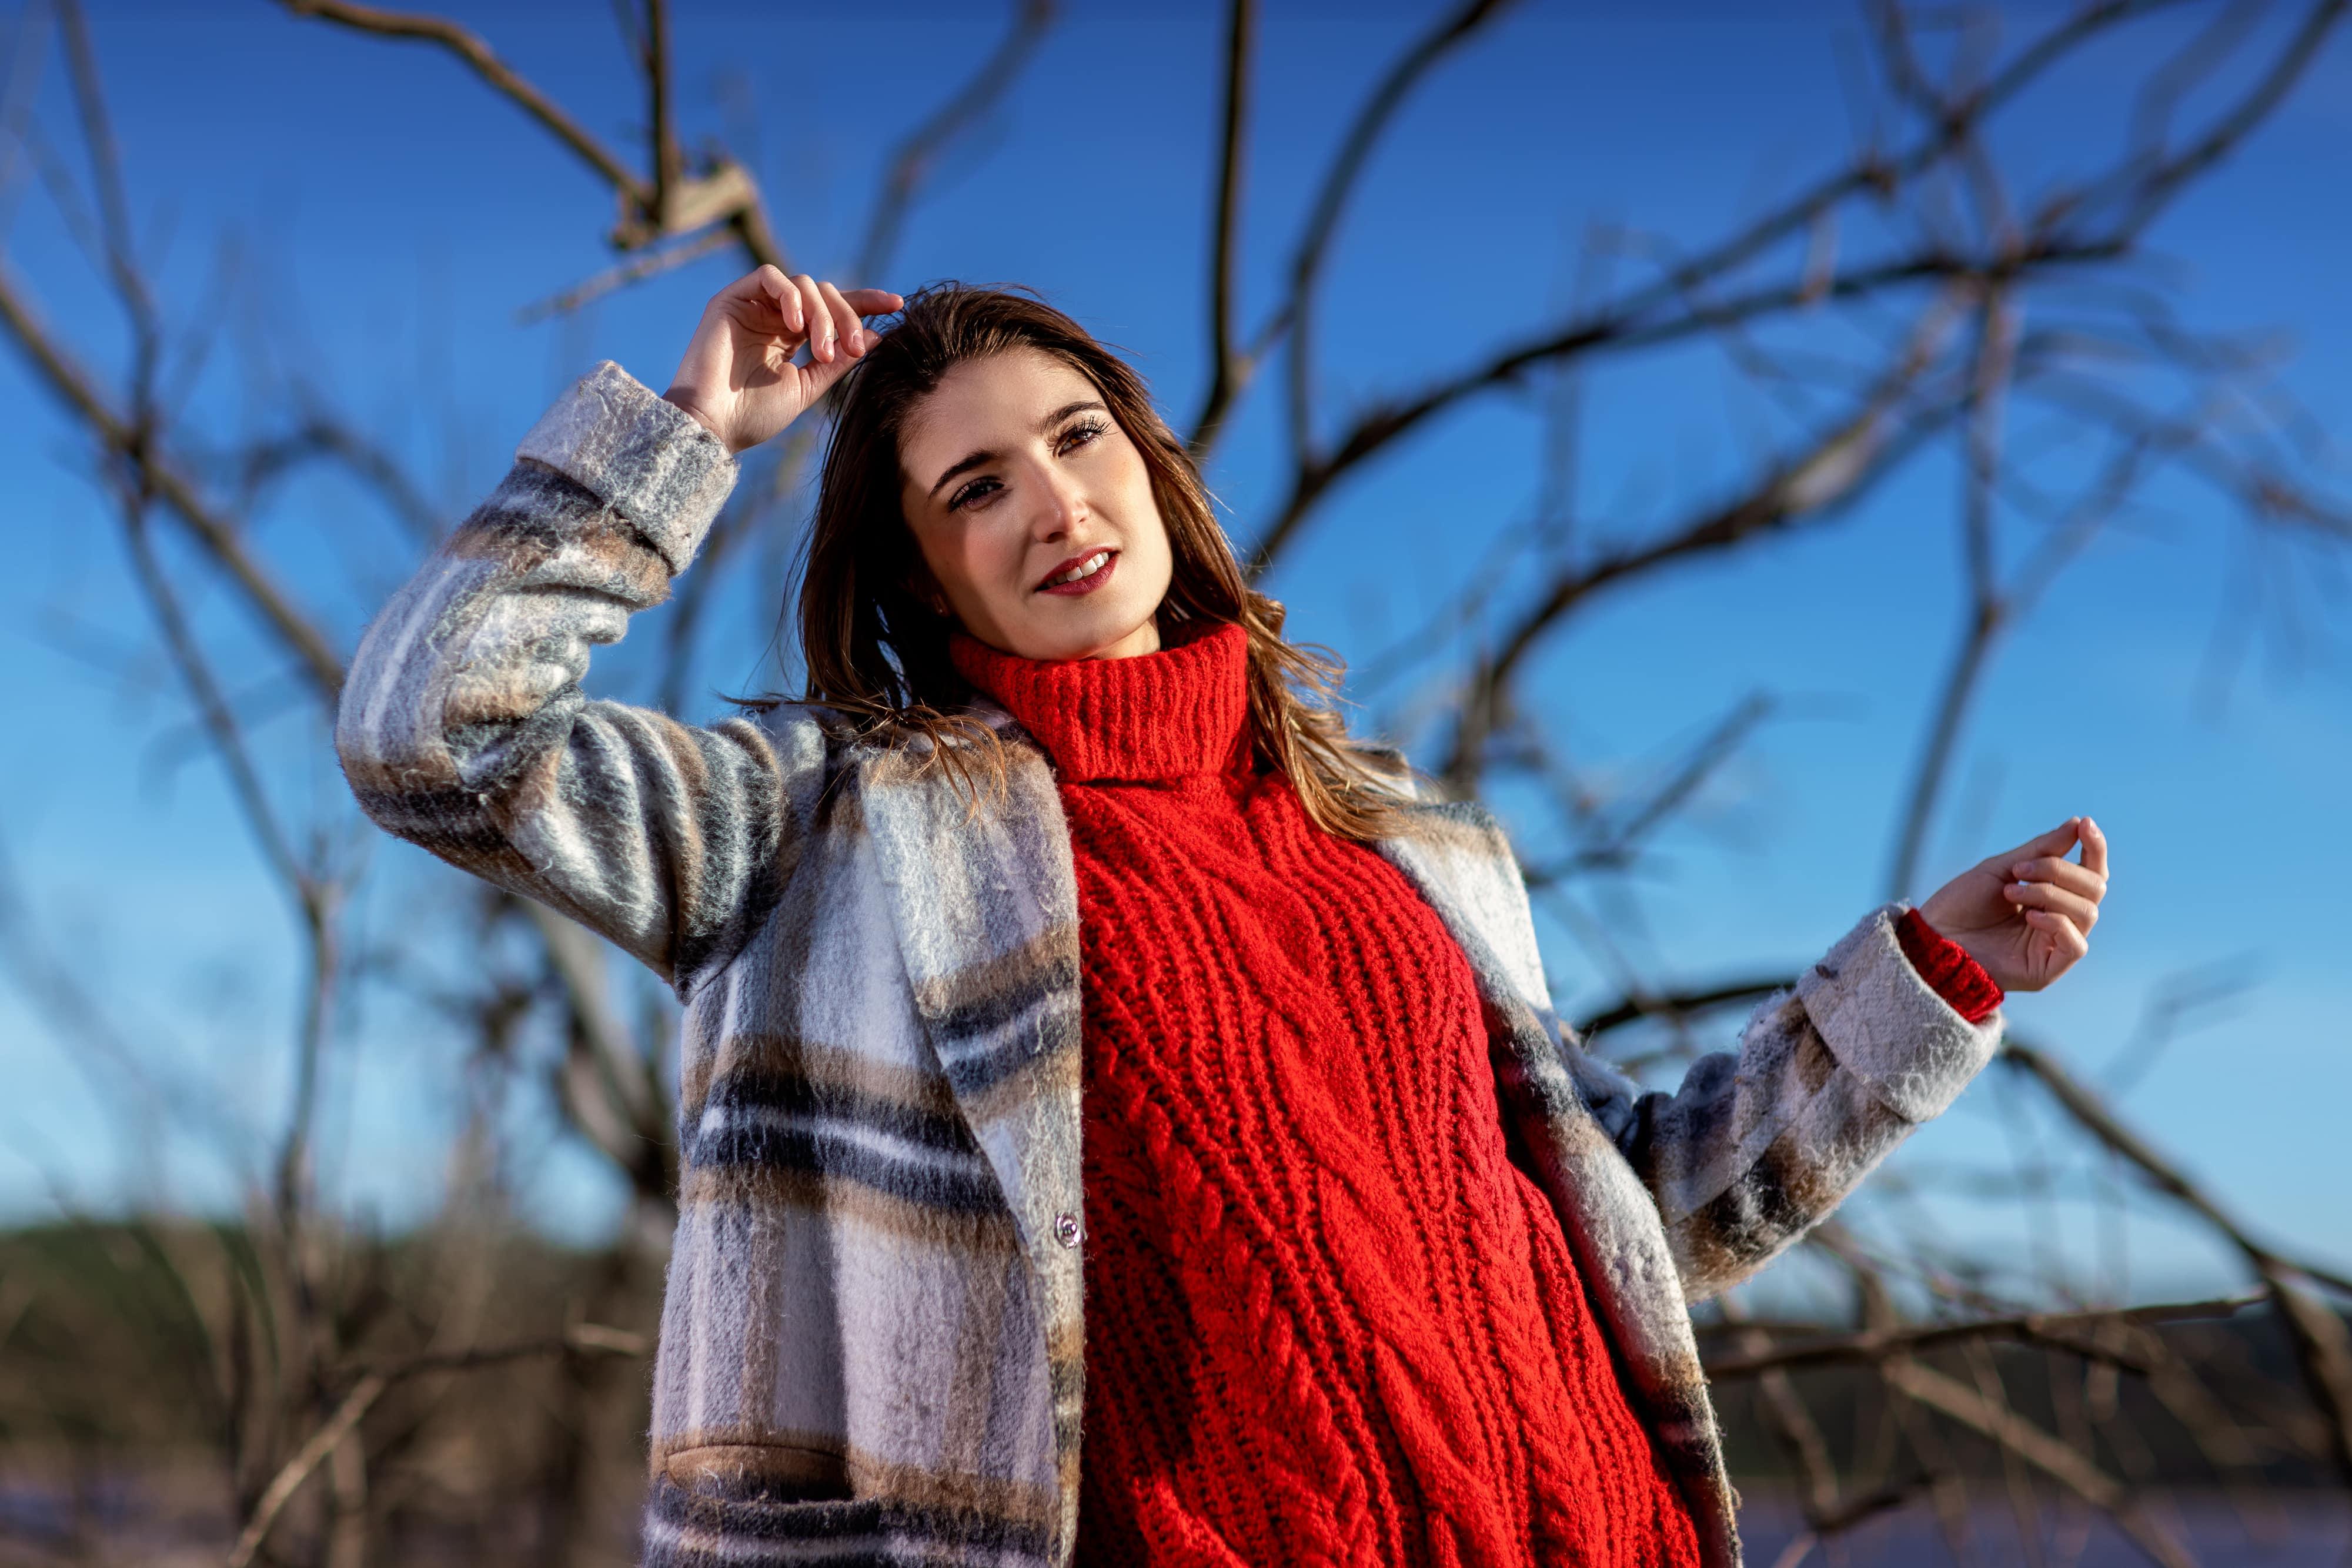 Cynthia, Hiver, Lifestyle, Plein air, Portrait, pretty, sweet, woman, www.DigitReagrds.com, young